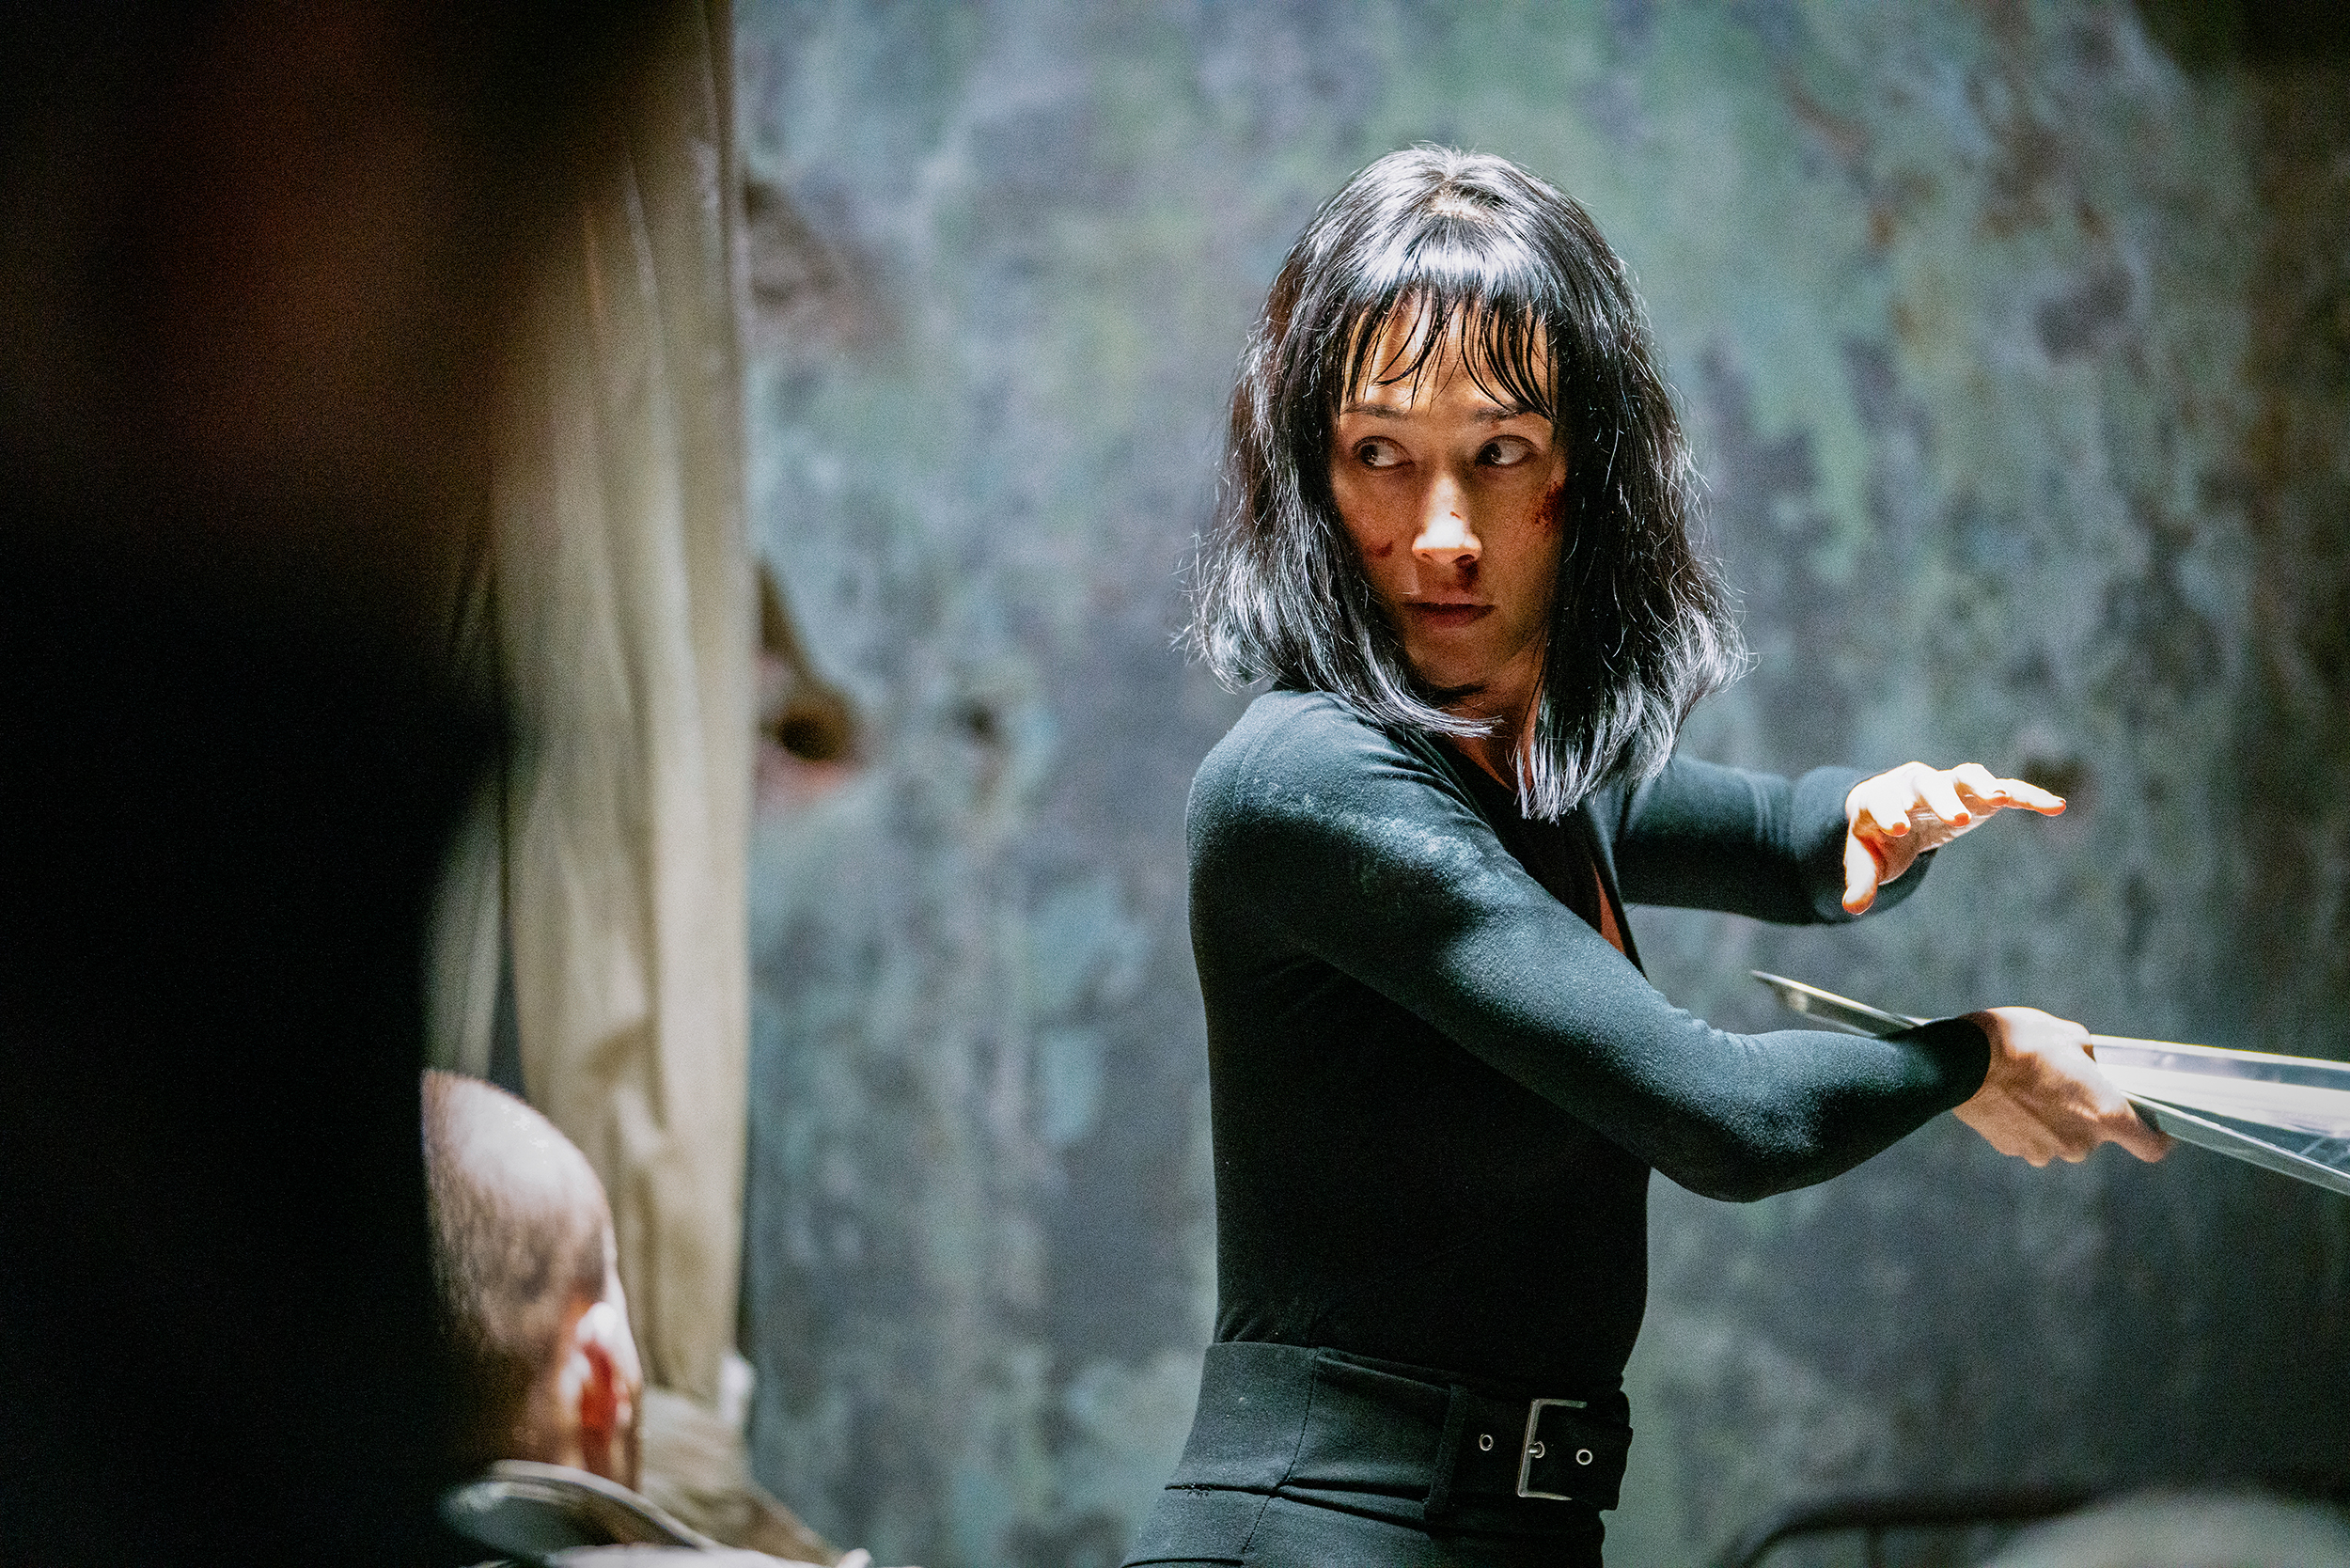 Maggie Q stars as Anna in the new film, T Protégé.